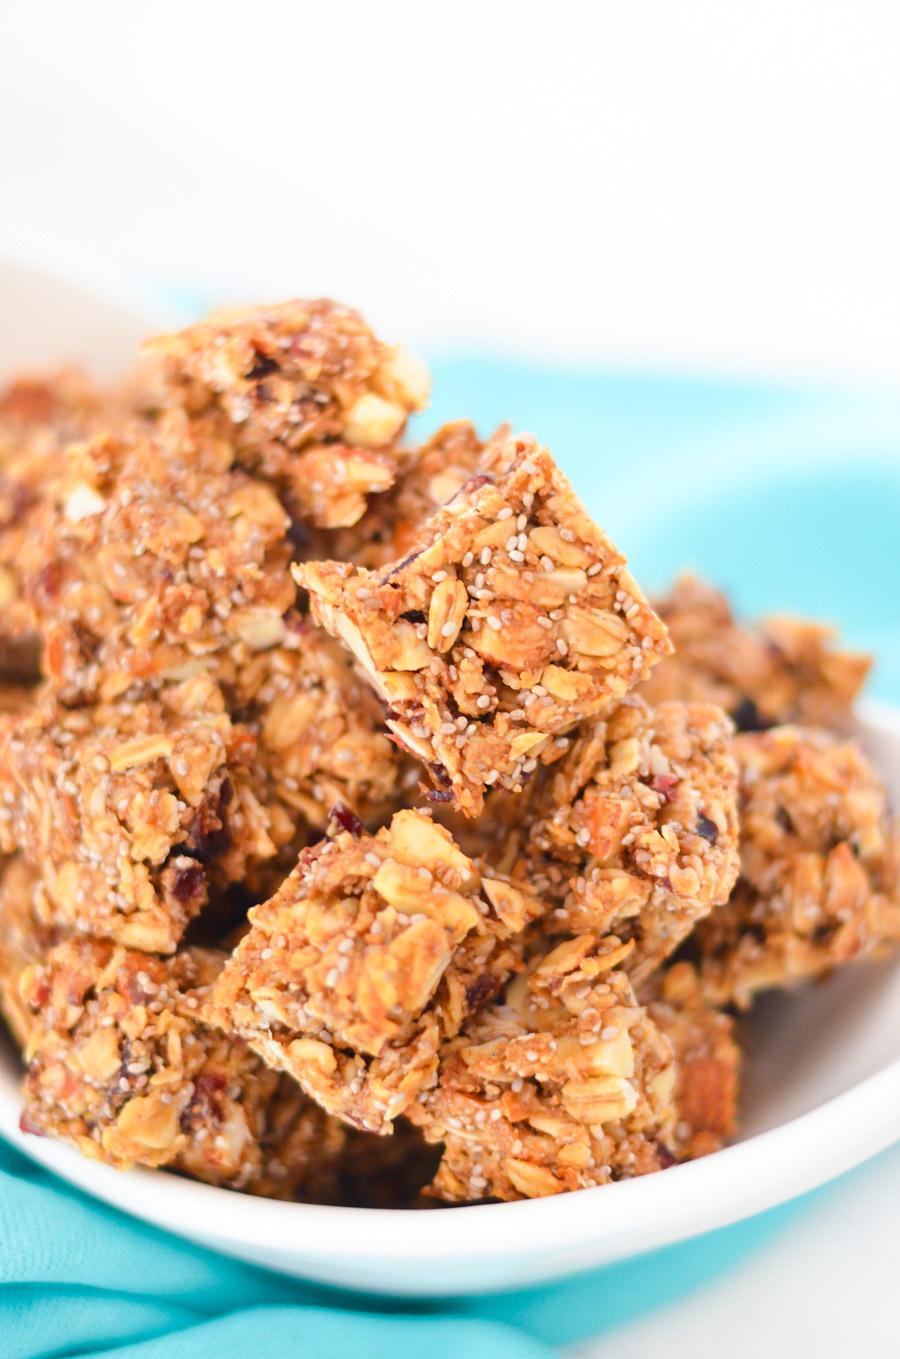 Chia Seed + Coconut Granola Bites Recipe w. Peanut Butter + Honey + Ground Flax Seeds - LA Healthy Food Blogger